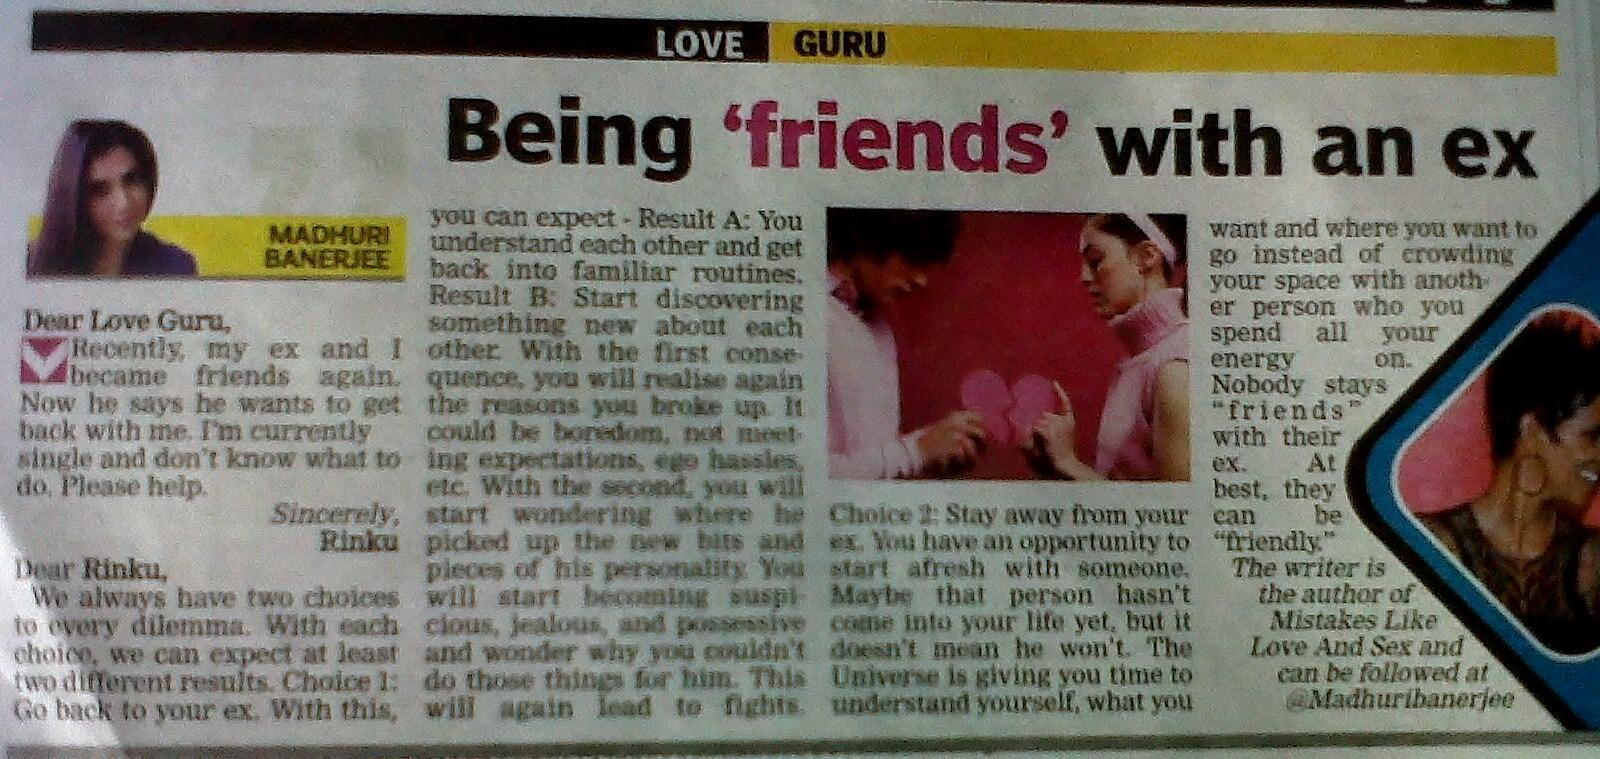 relationship advice column for women